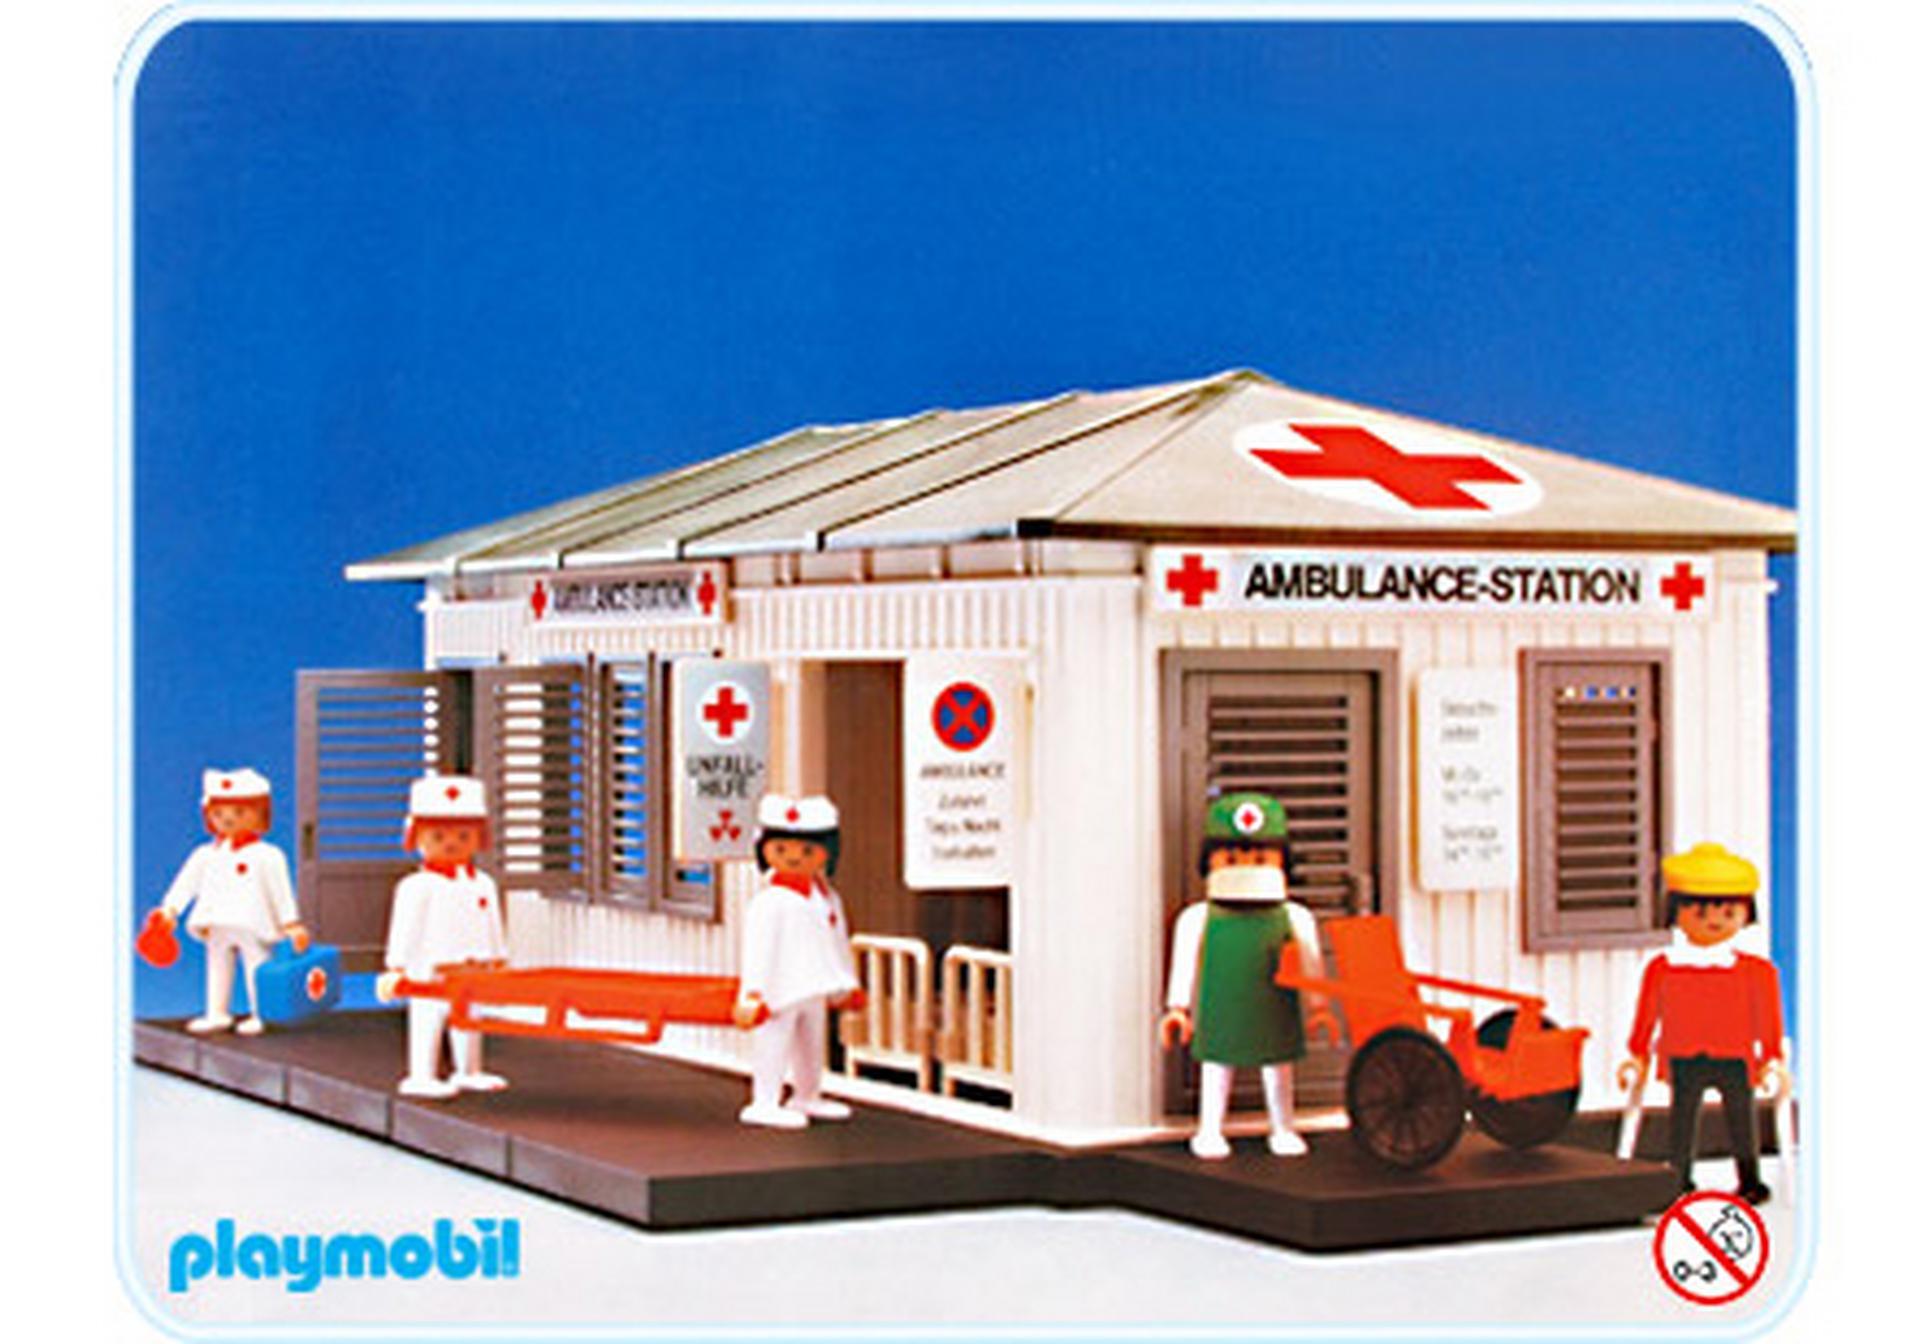 Ambulance station 3432 a playmobil deutschland for Jugendzimmer playmobil